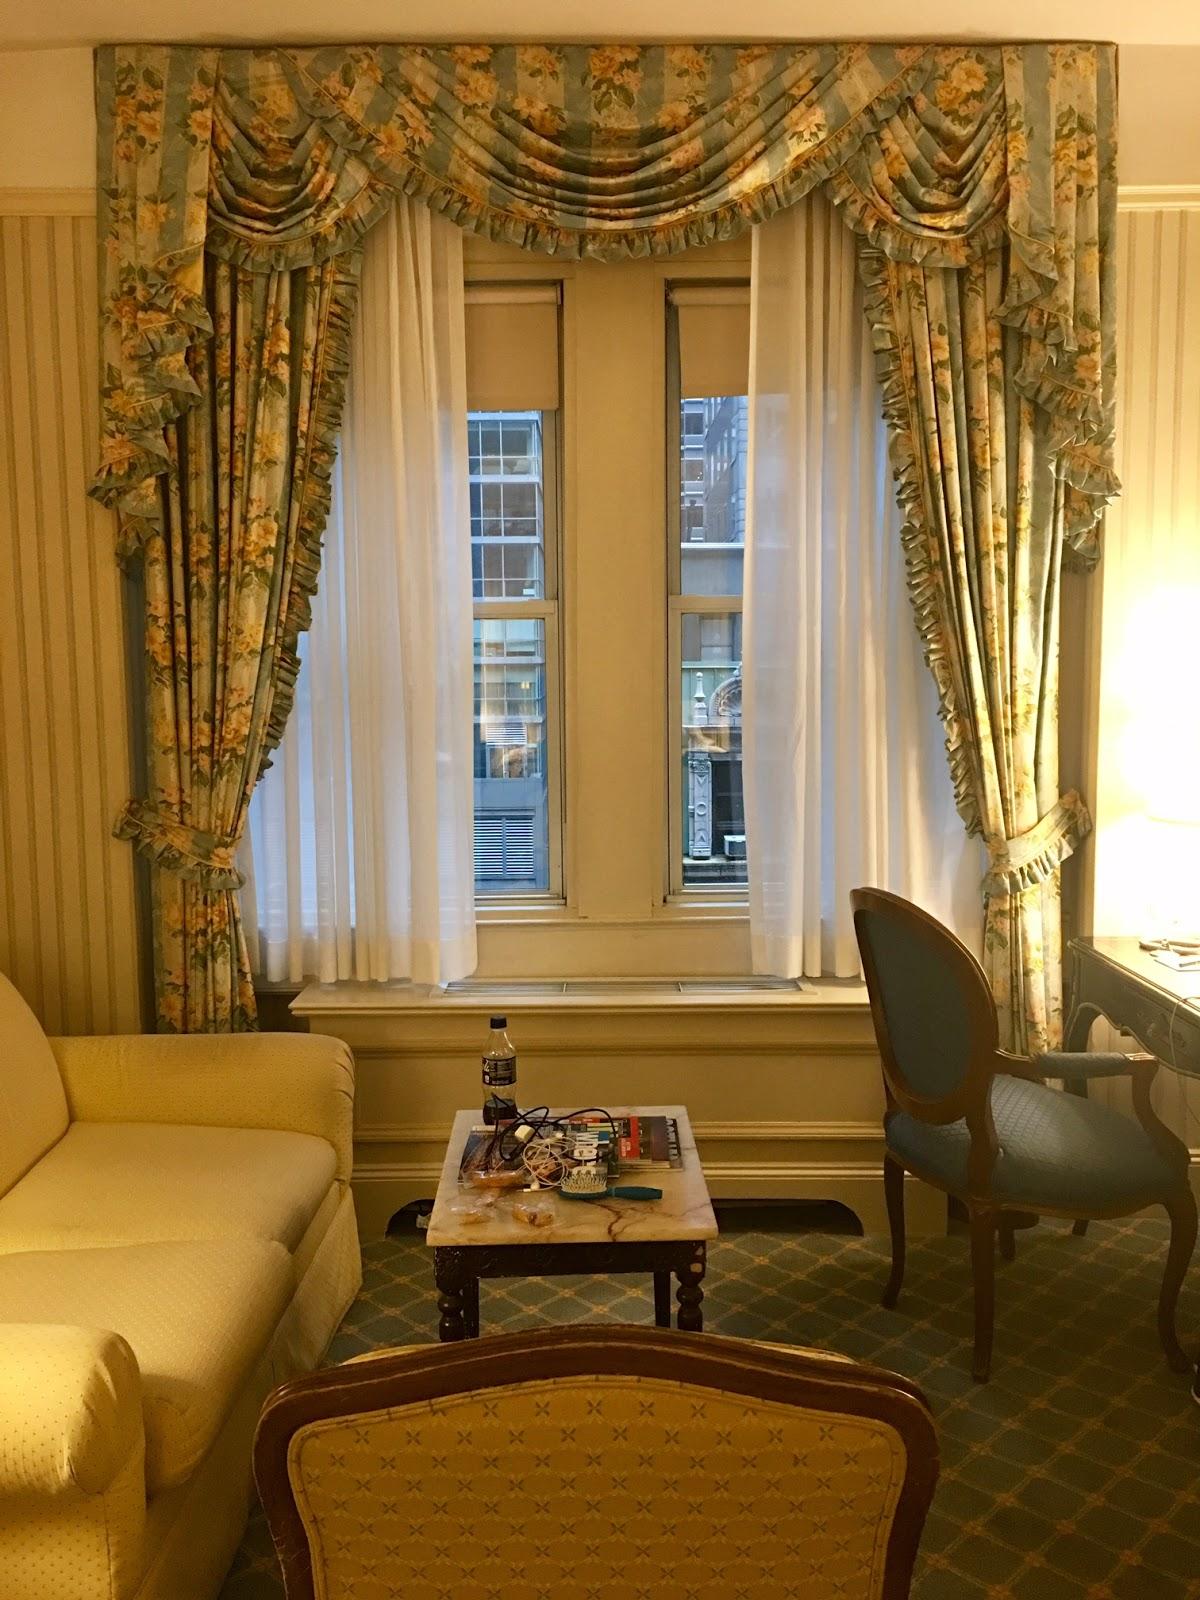 Hotel Elysee Room